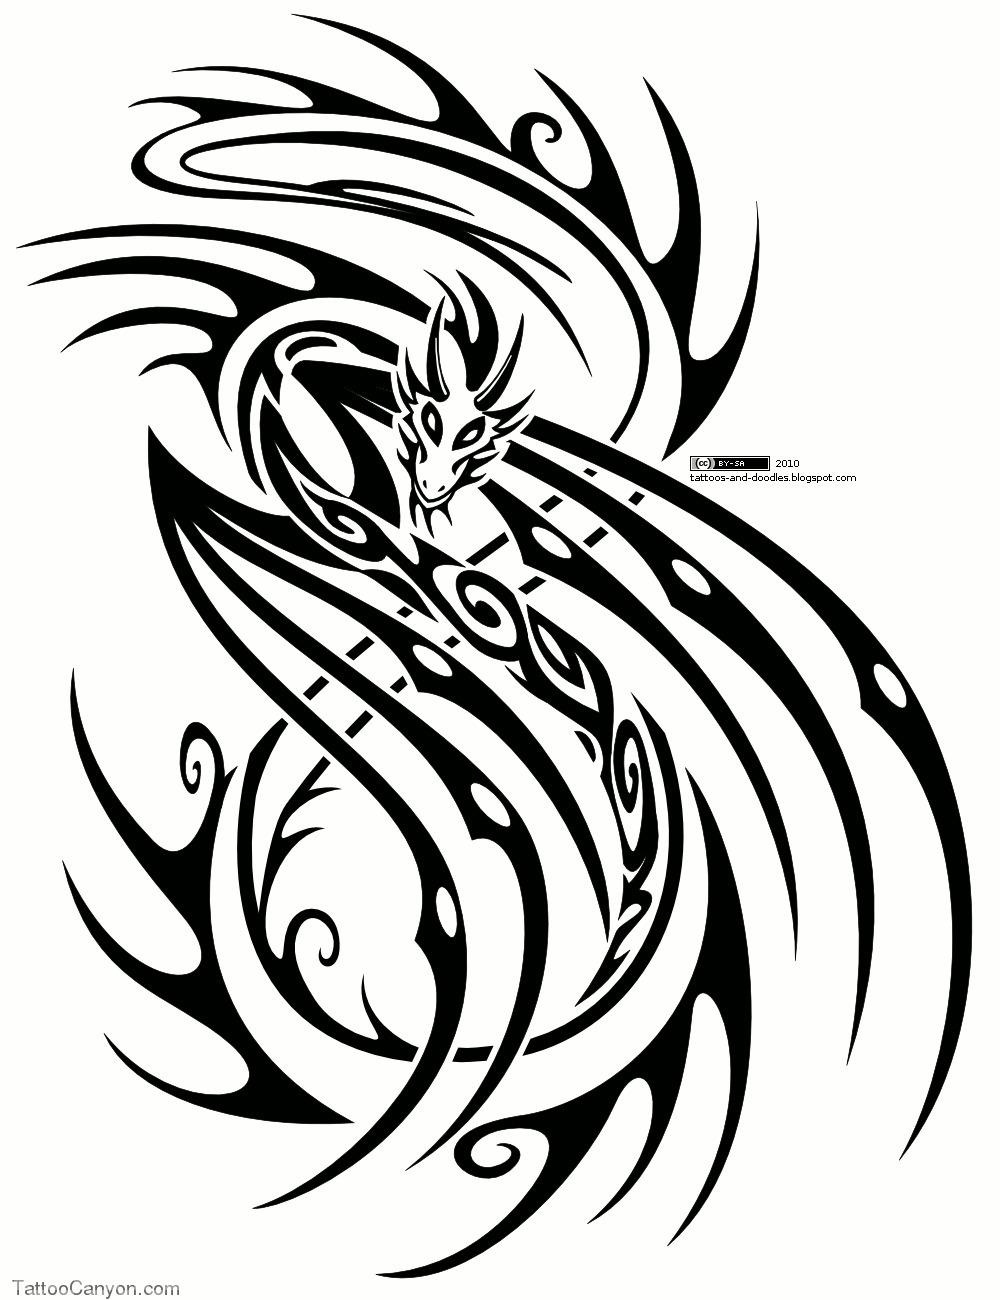 Tattoo designs free download